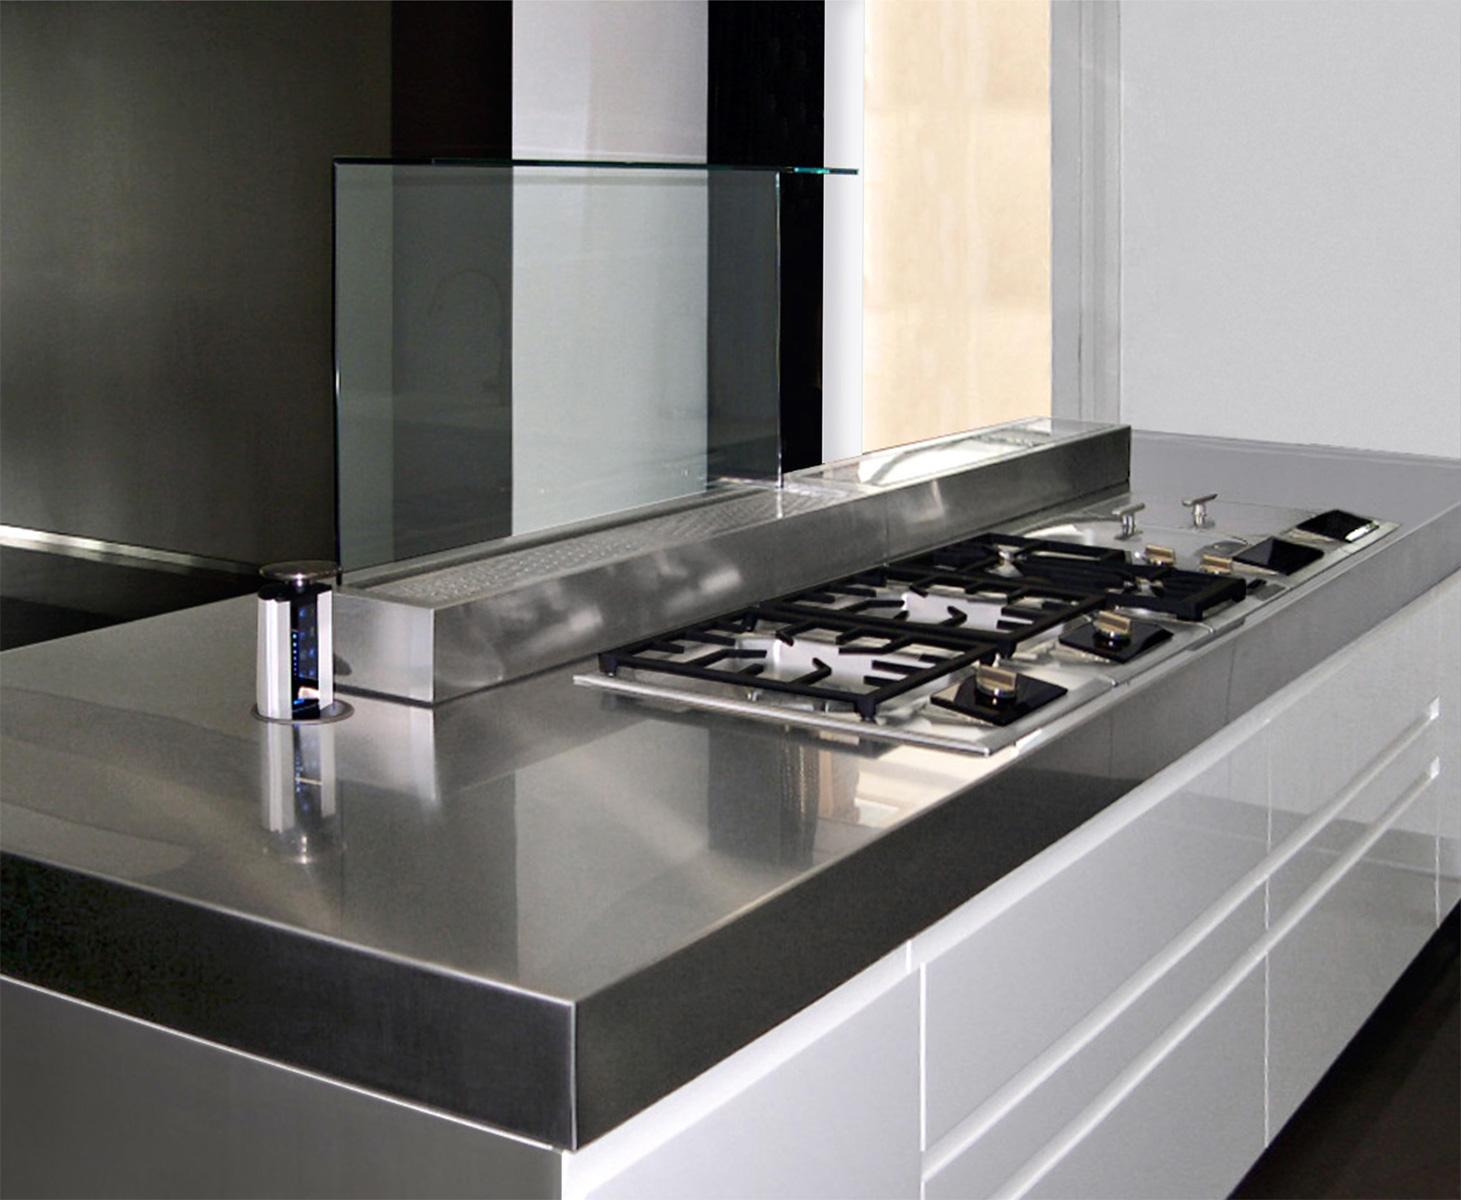 Home design novastil - Top cucina acciaio inox prezzo ...